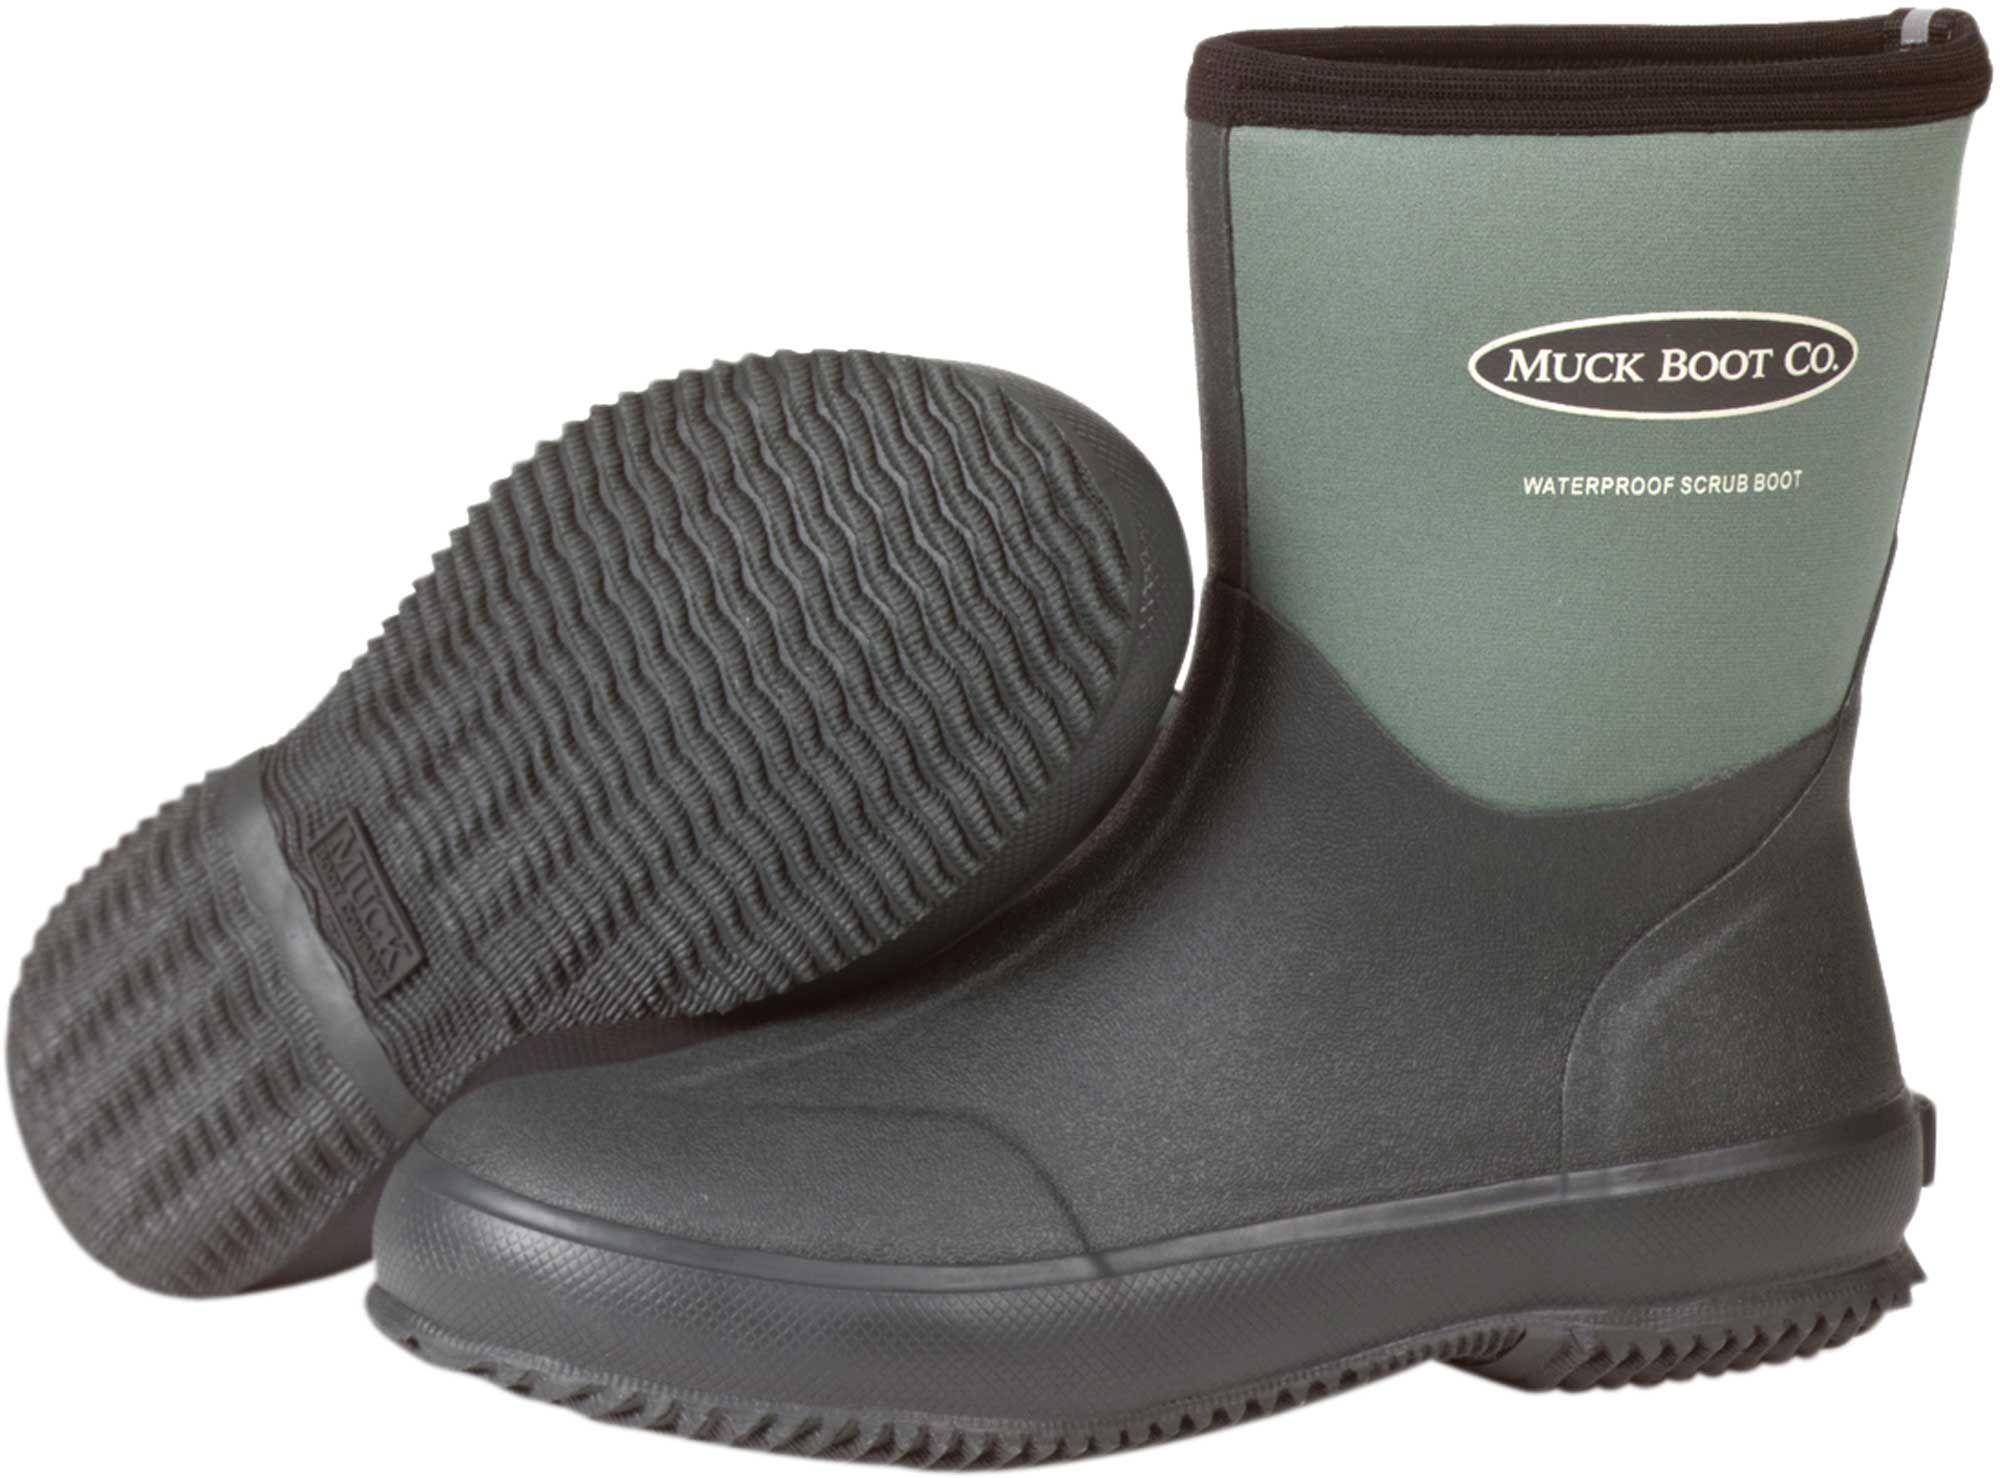 Muck Boot Waterproof Scrub Boots| DICK'S Sporting Goods